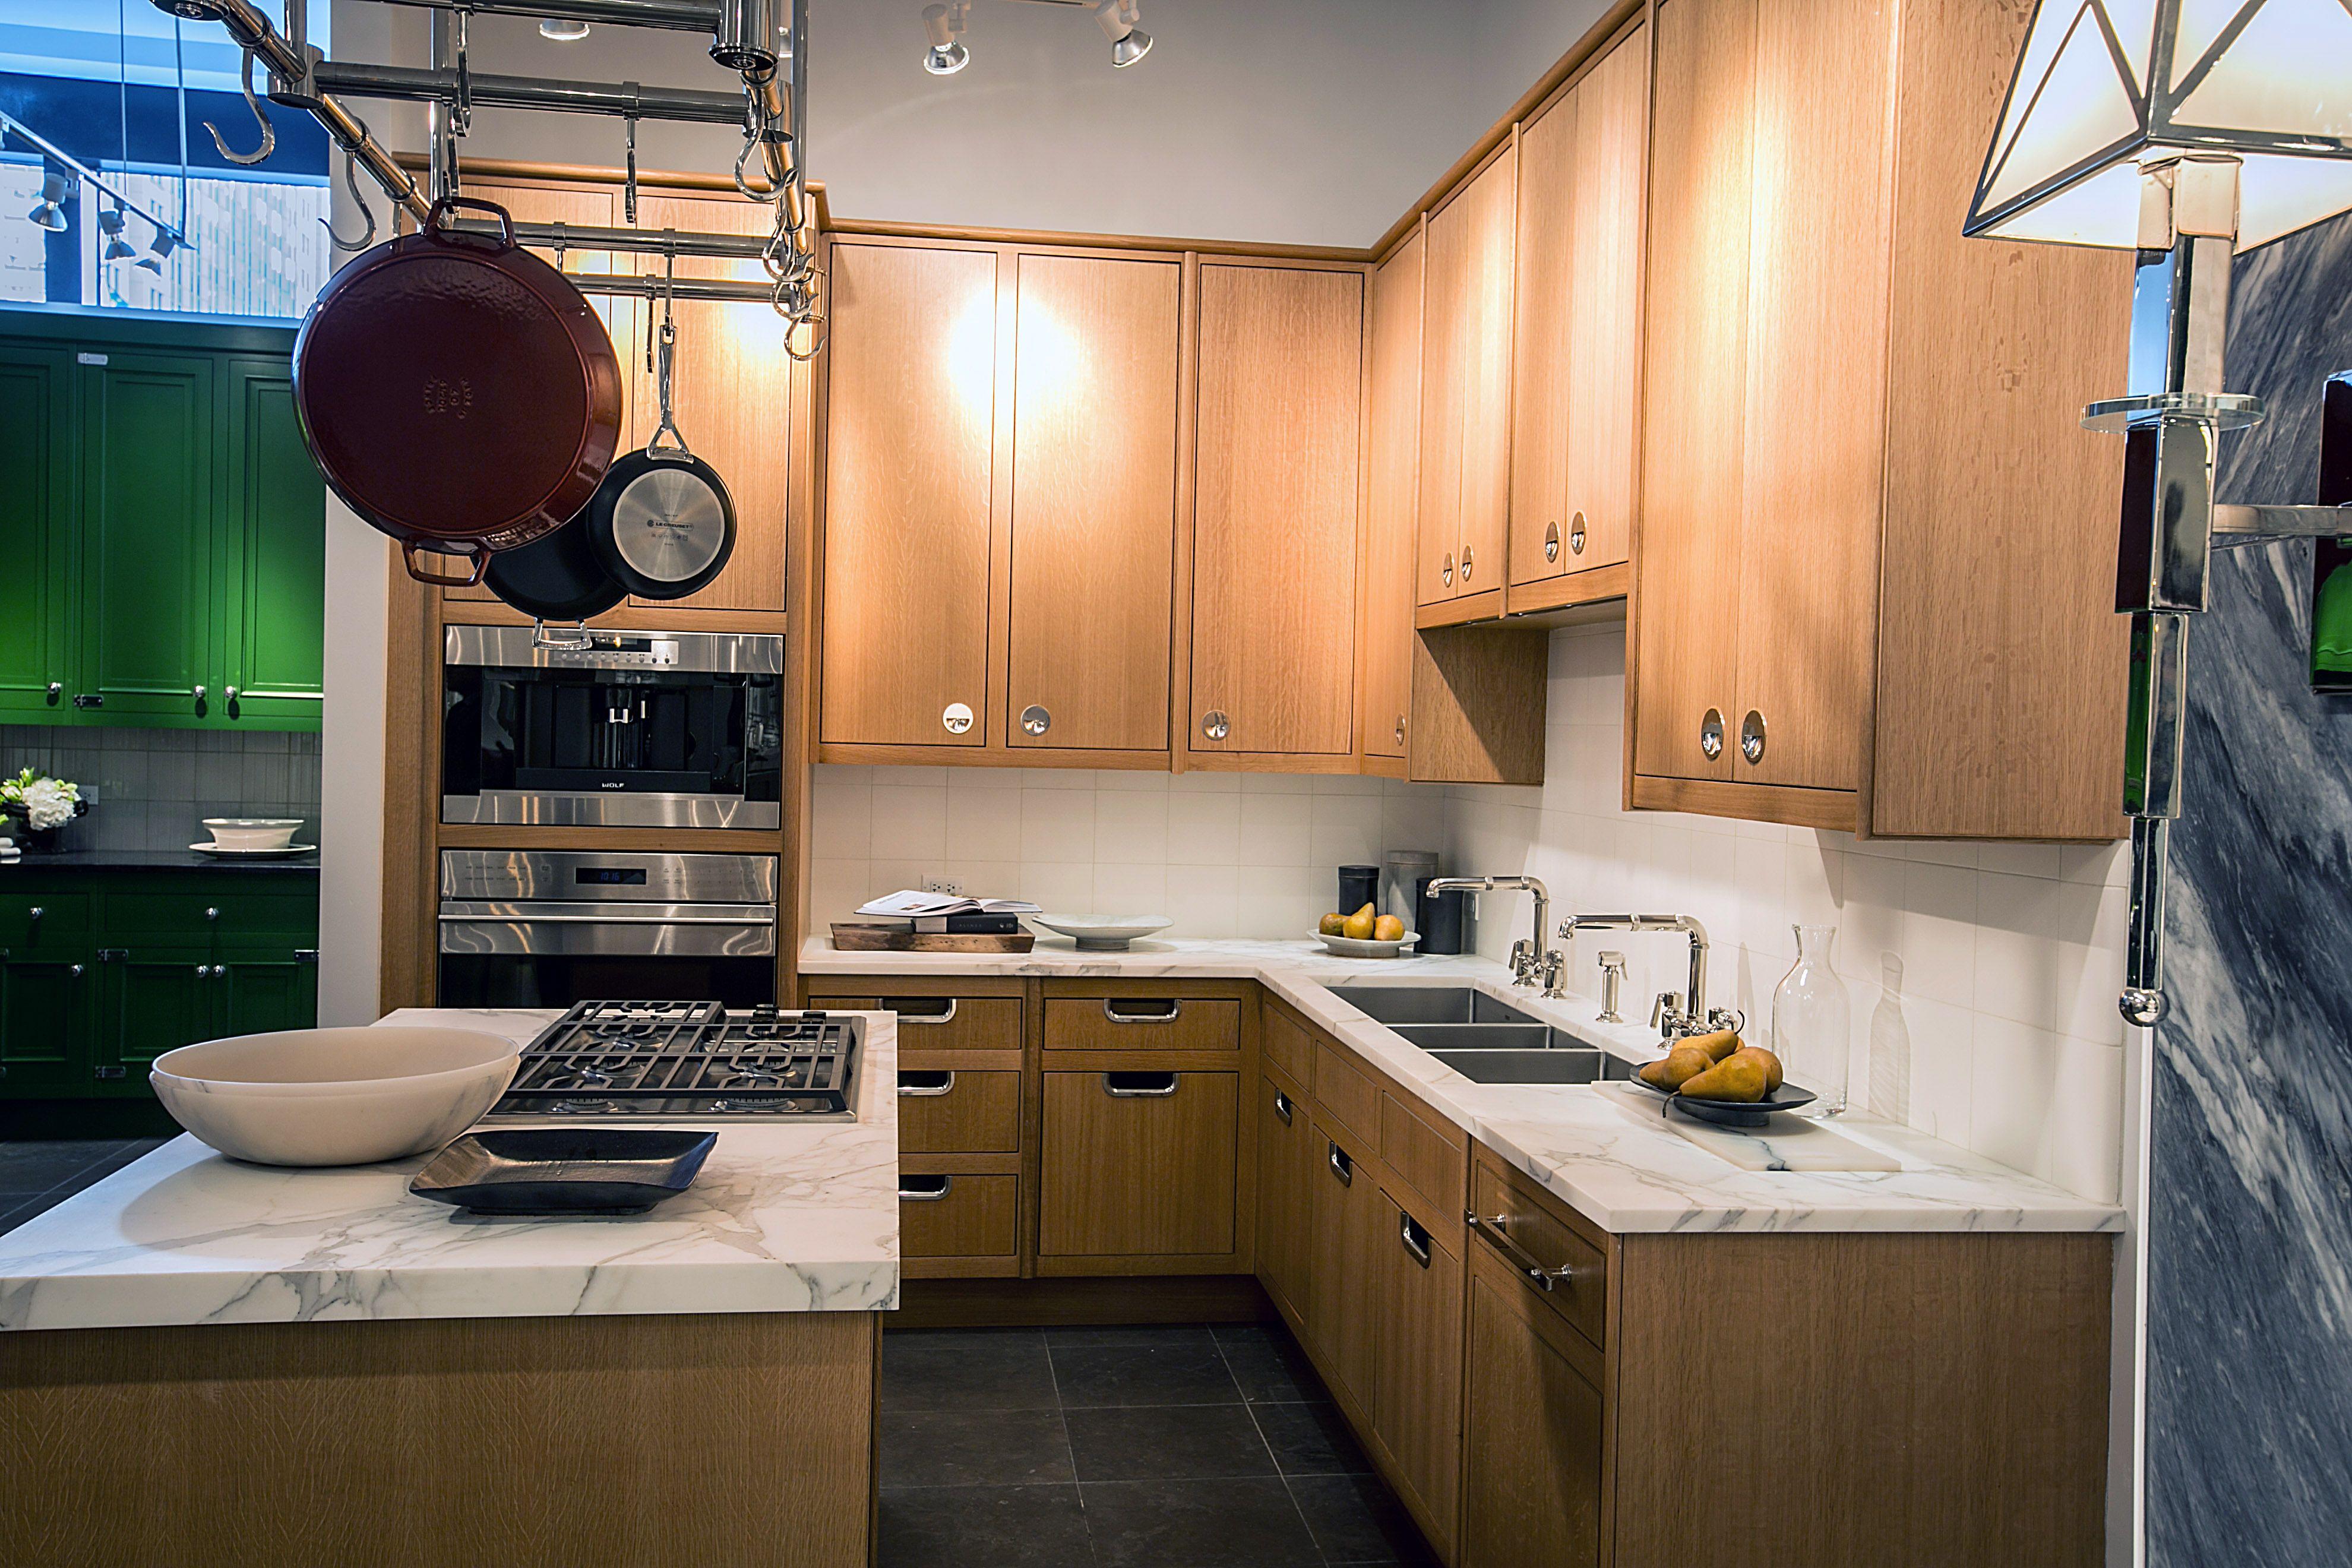 Waterworks Kitchen In Chicago Showroom Classic Kitchen Cabinets Cabinetry Design Classic Kitchens